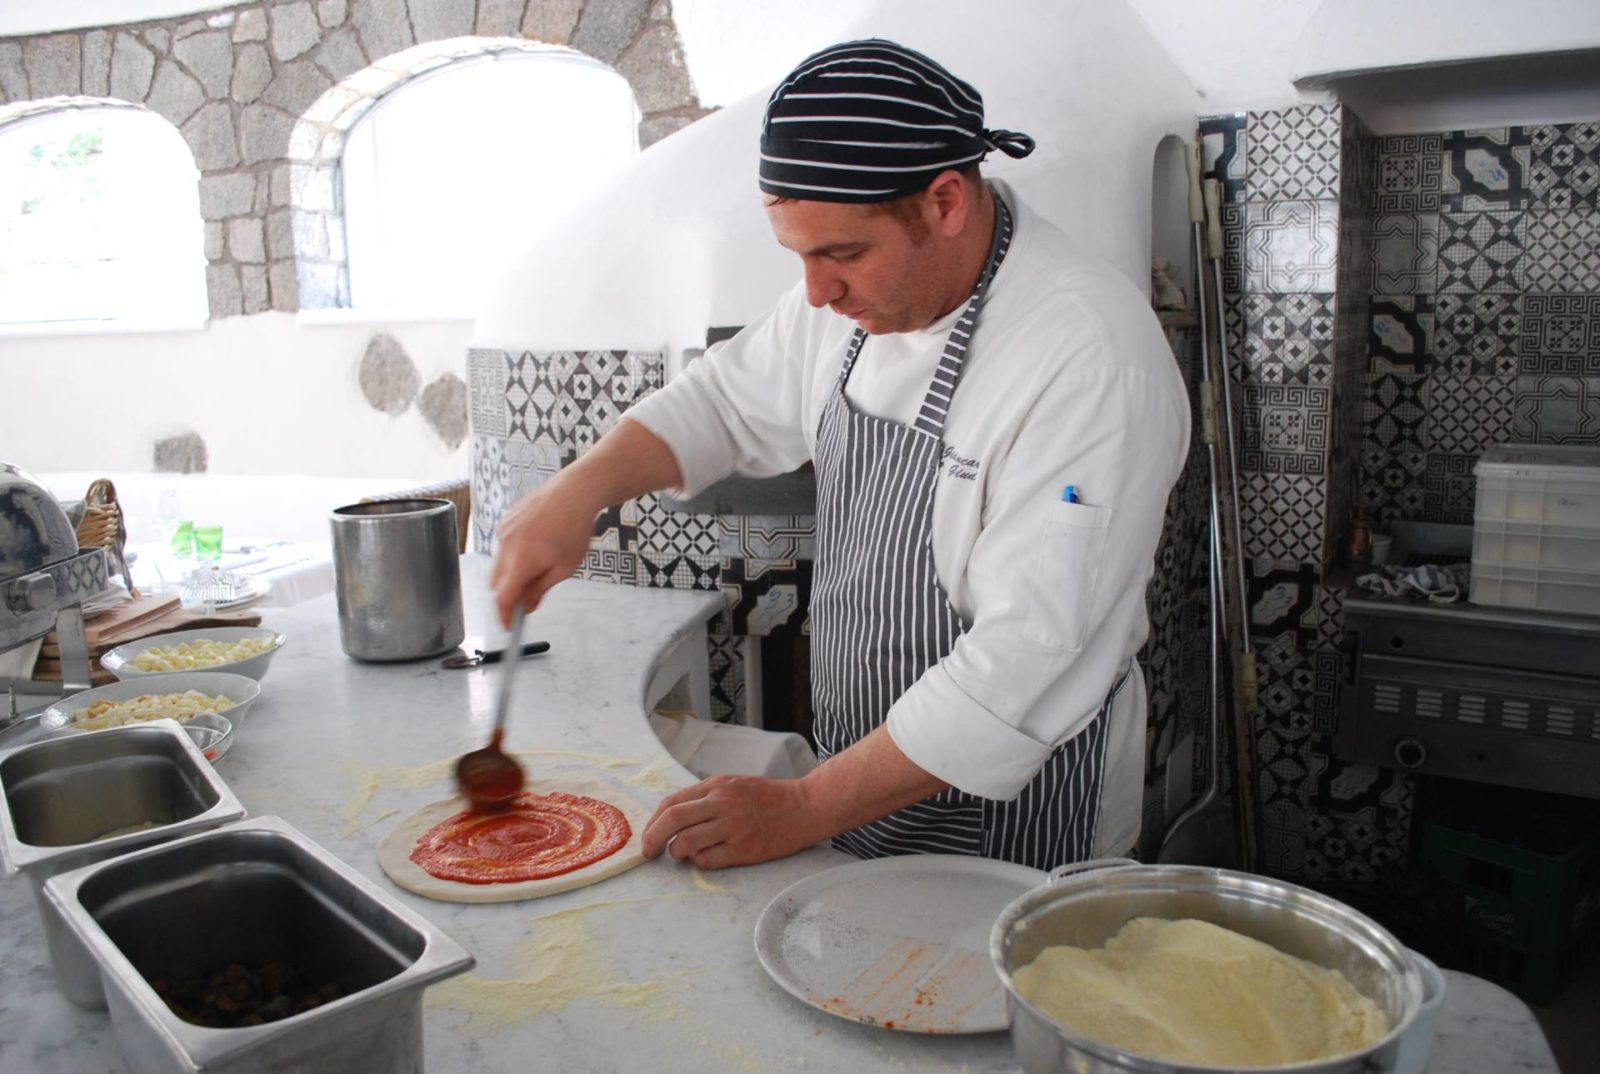 garden-villas-resport-ischia-pizza-making